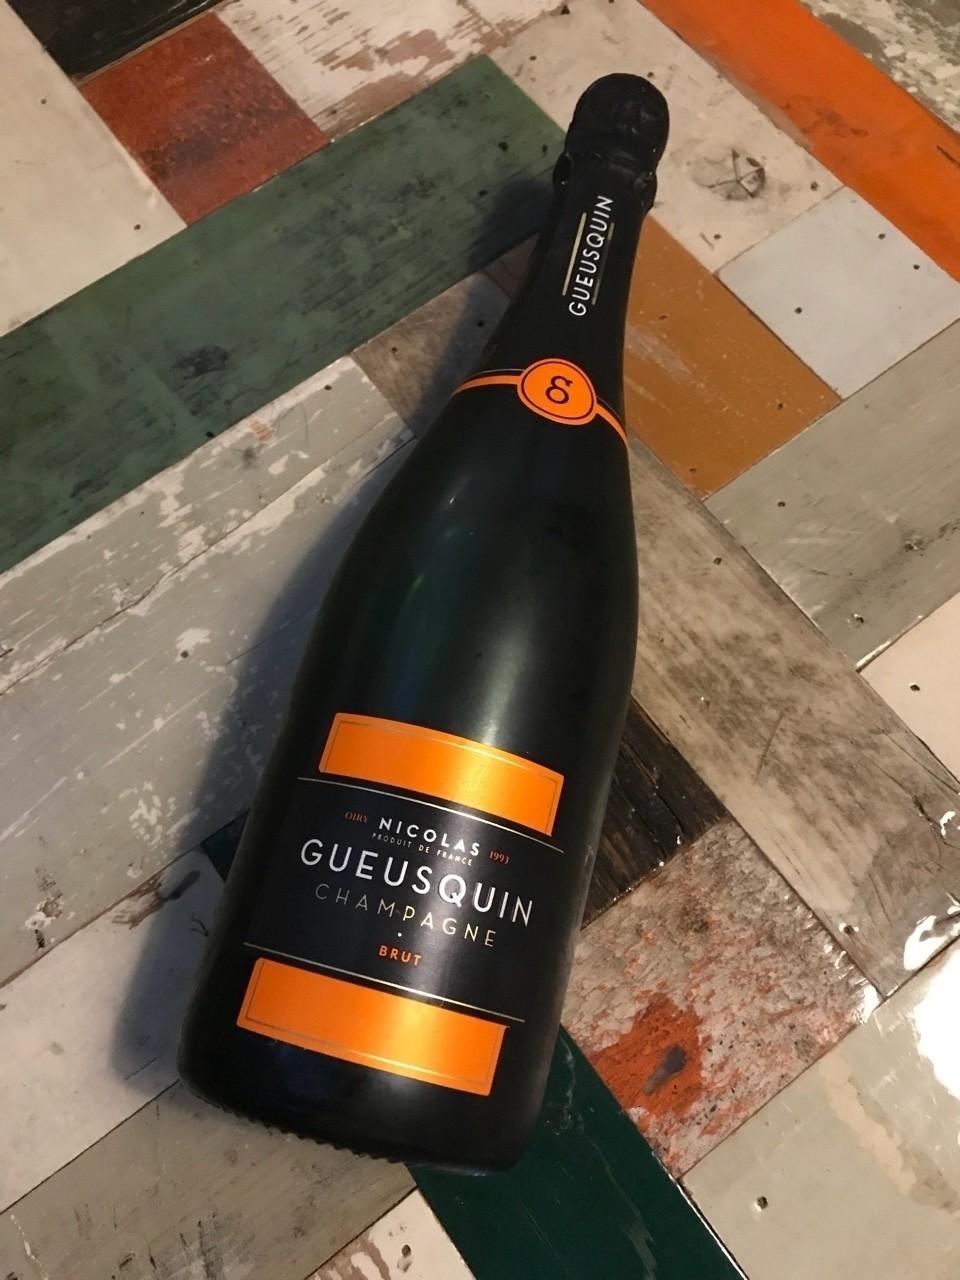 #wine #vino #champagne #ワイン #葡萄酒 #酒